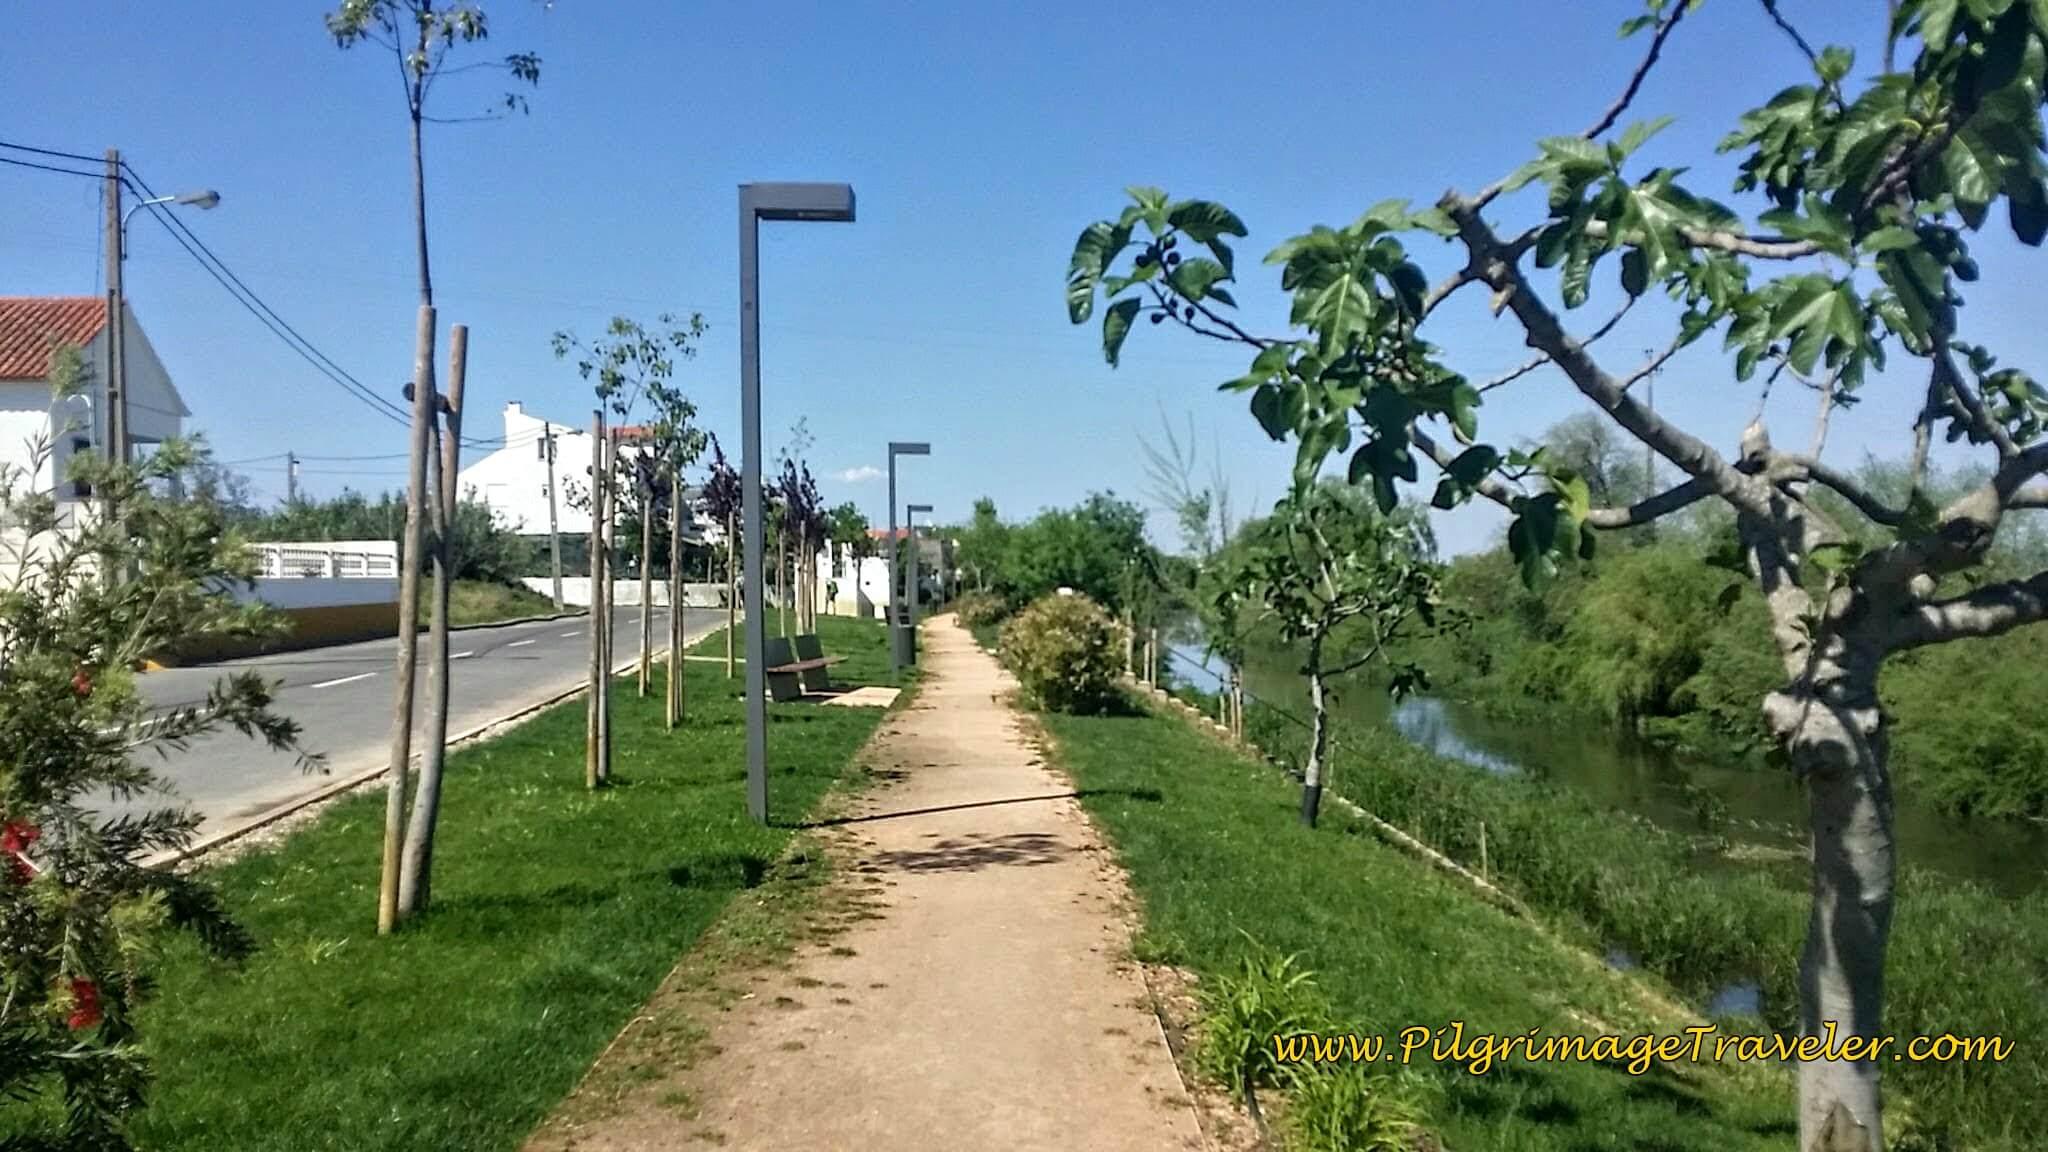 Path along the Rua Catarina Eufémia